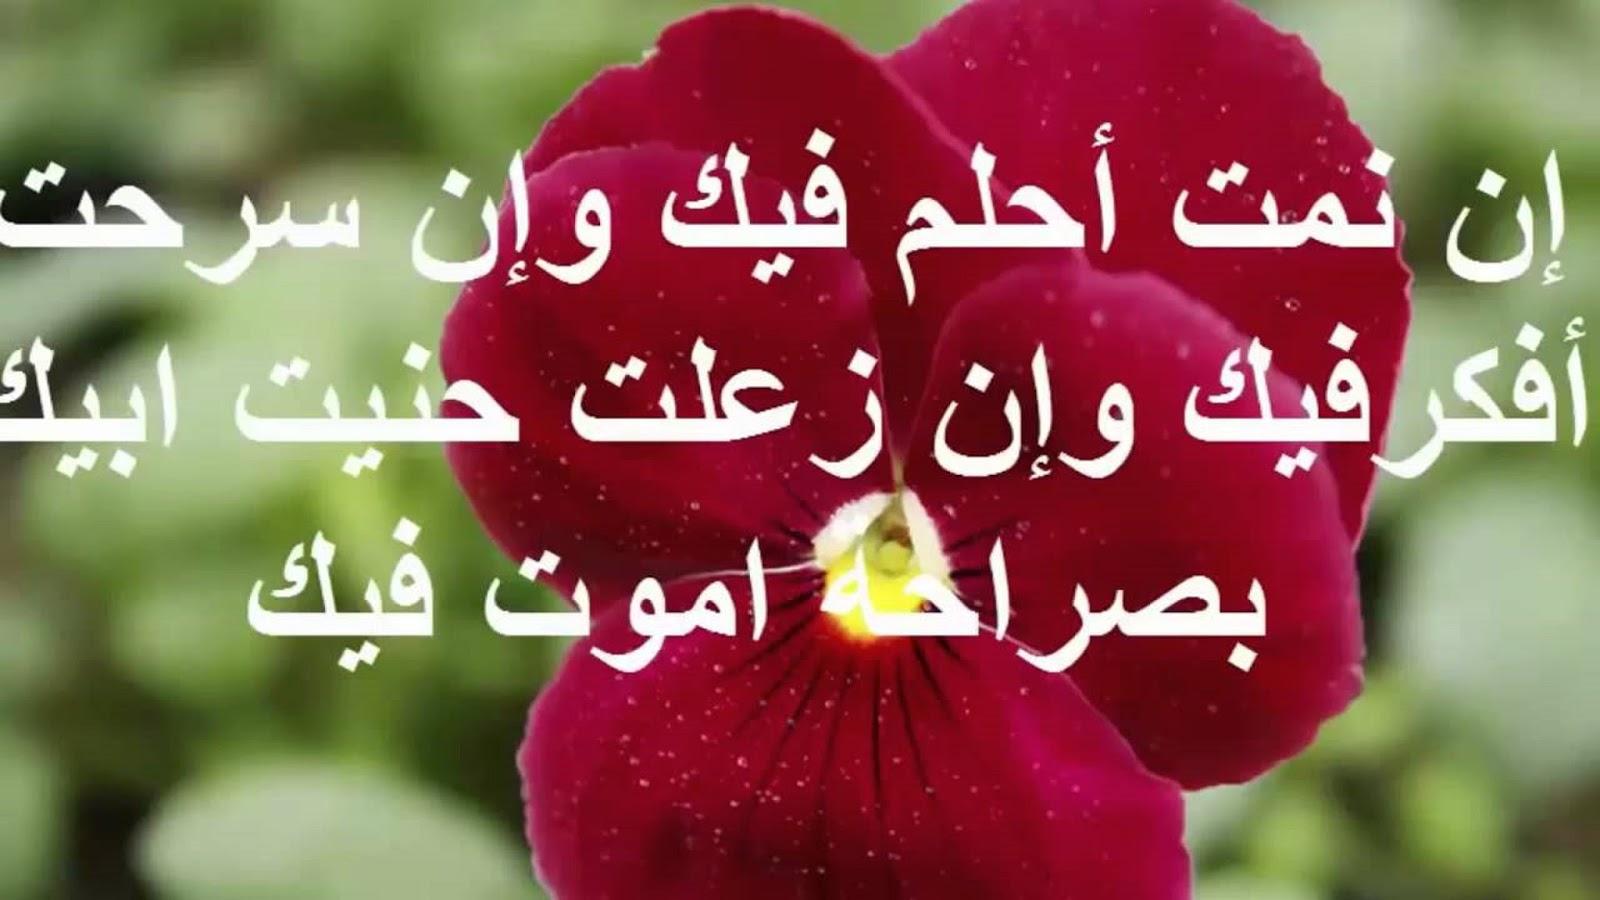 بالصور رسائل حب ورومنسيه , كلمات رومانسيه بين الاحبه unnamed file 251